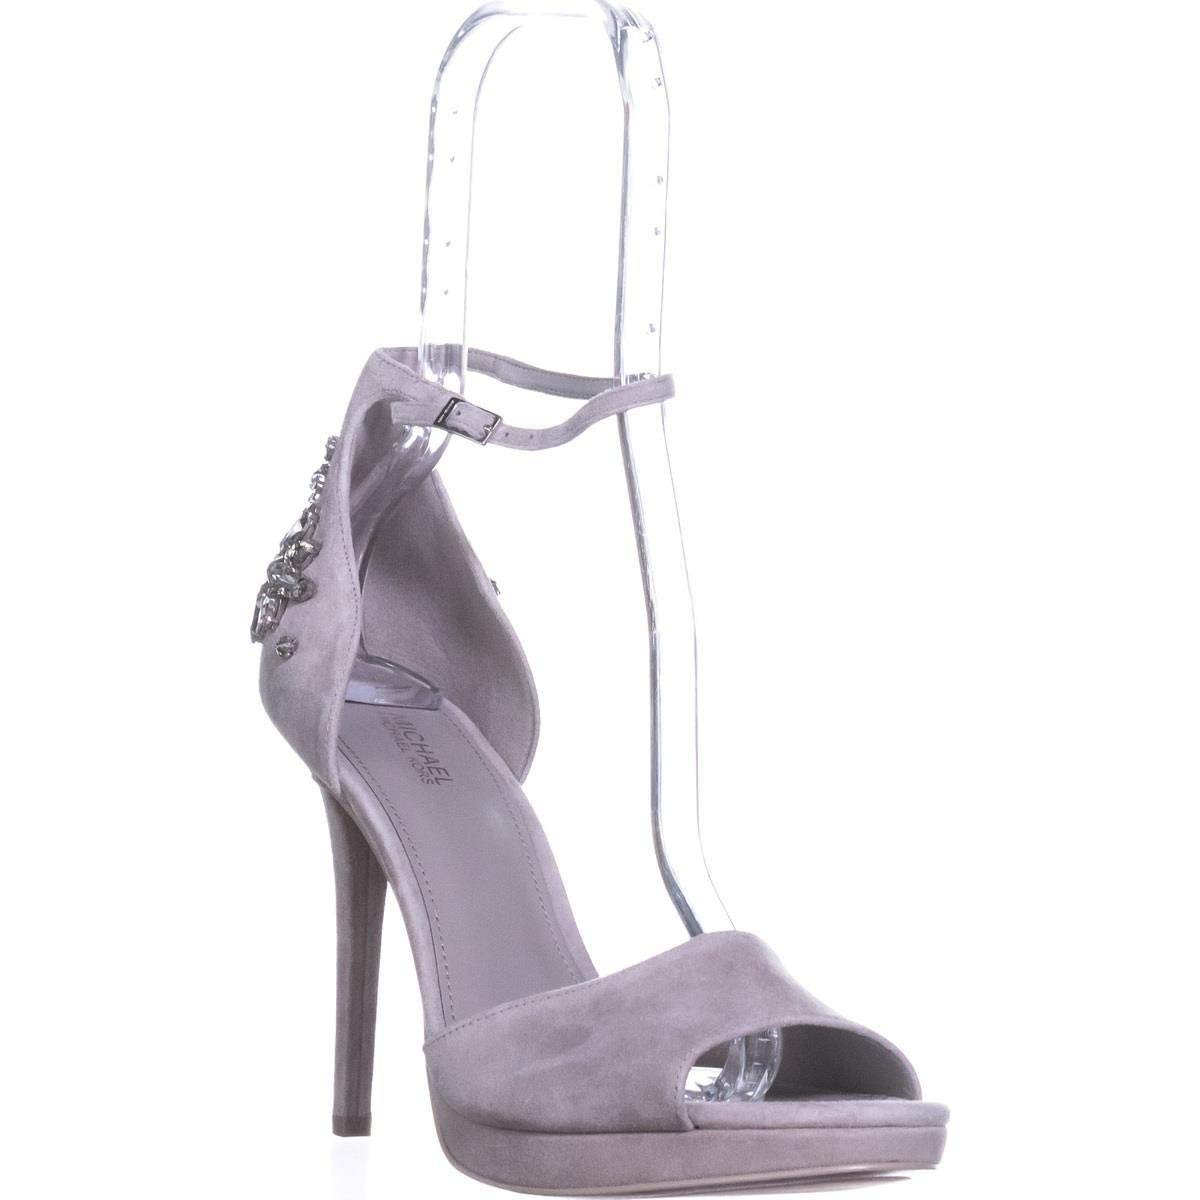 970d246cc4d Details about MICHAEL Michael Kors Women's Patti Jeweled Platform Sandal,  Grey, Size 9.0 mPRU